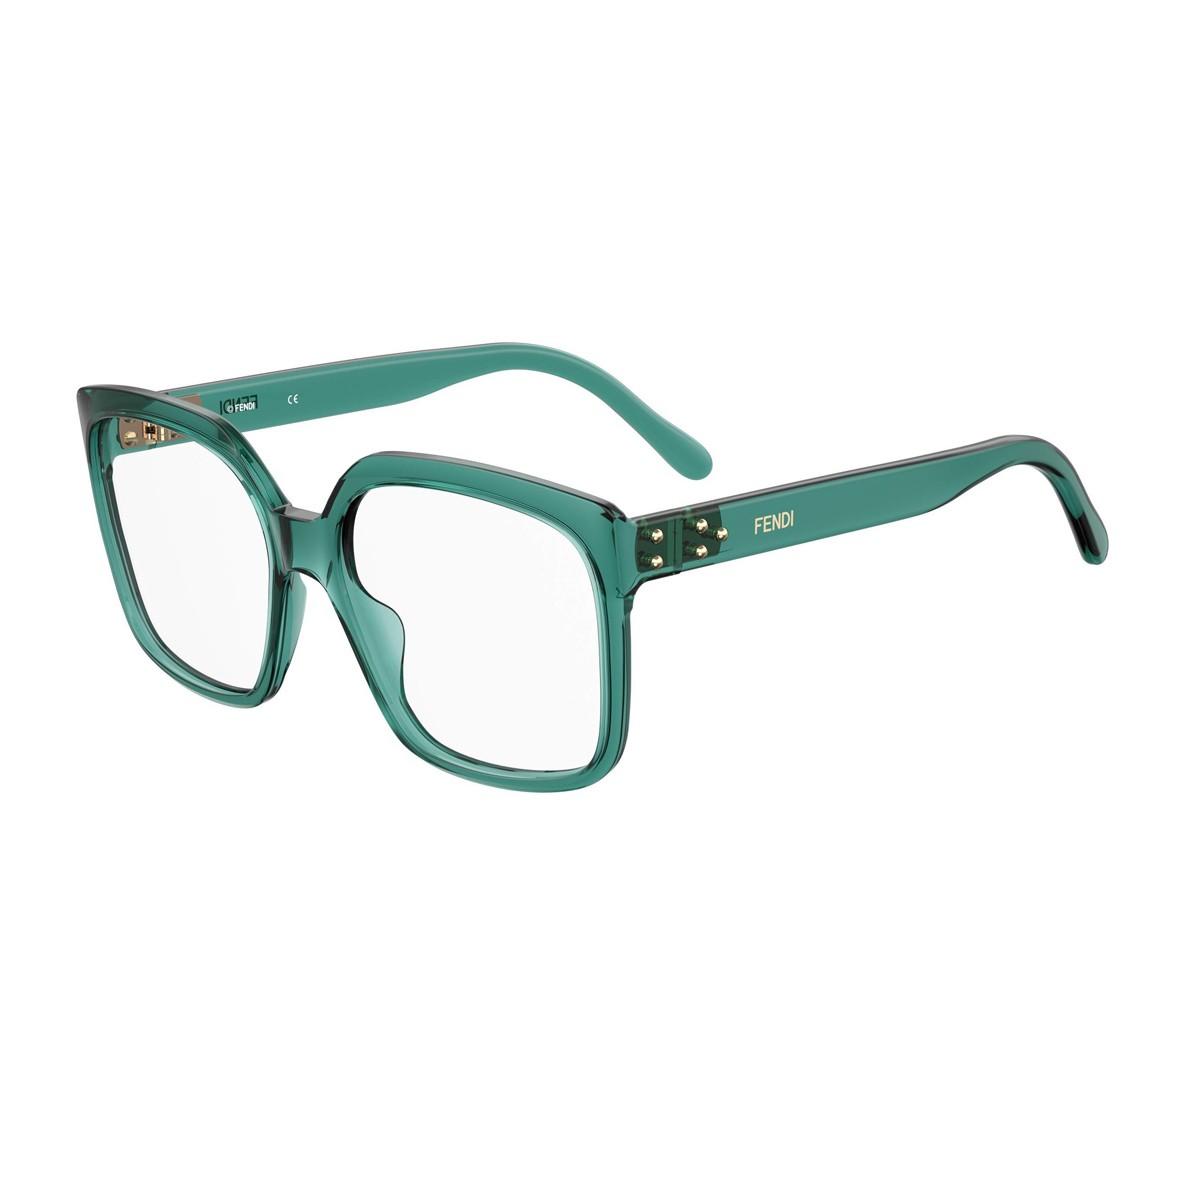 Fendi FF 0420 | Women's eyeglasses